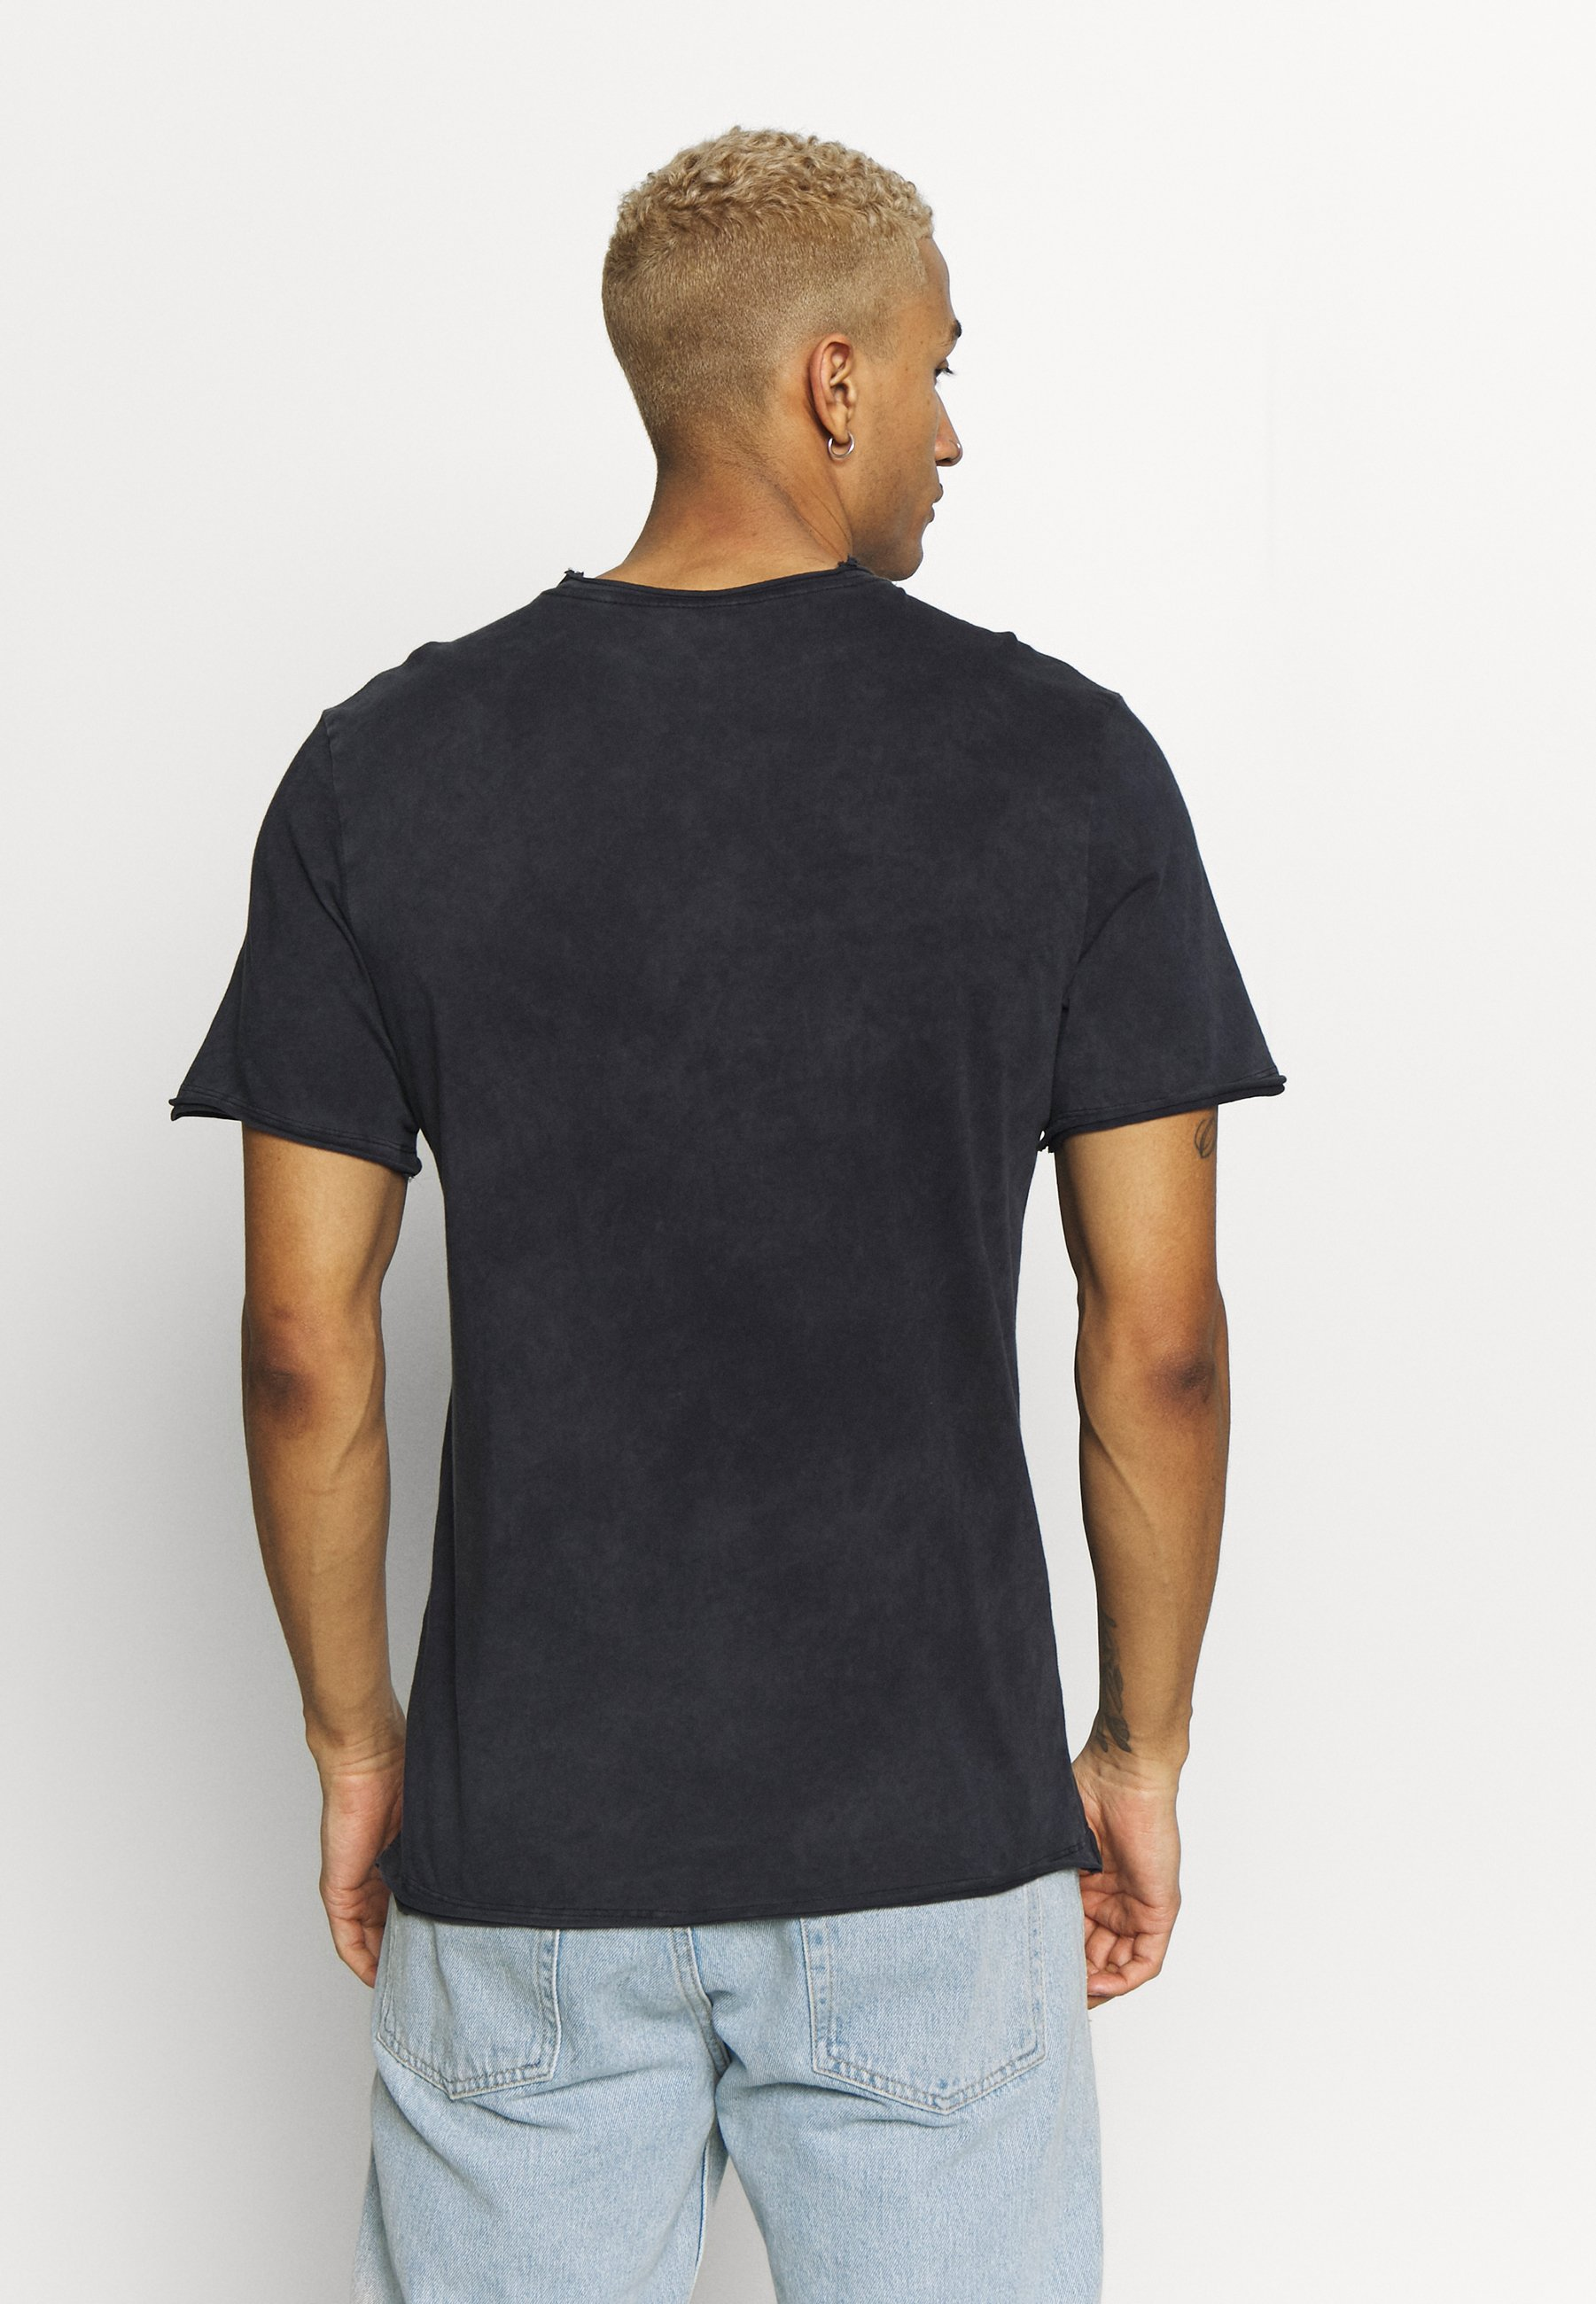 Nye Stilarter Hurtig Levering Tøj til herrer Nike Sportswear ICON FUTURA WASH T-shirts print black/white r2pb0Q FrLIMQ